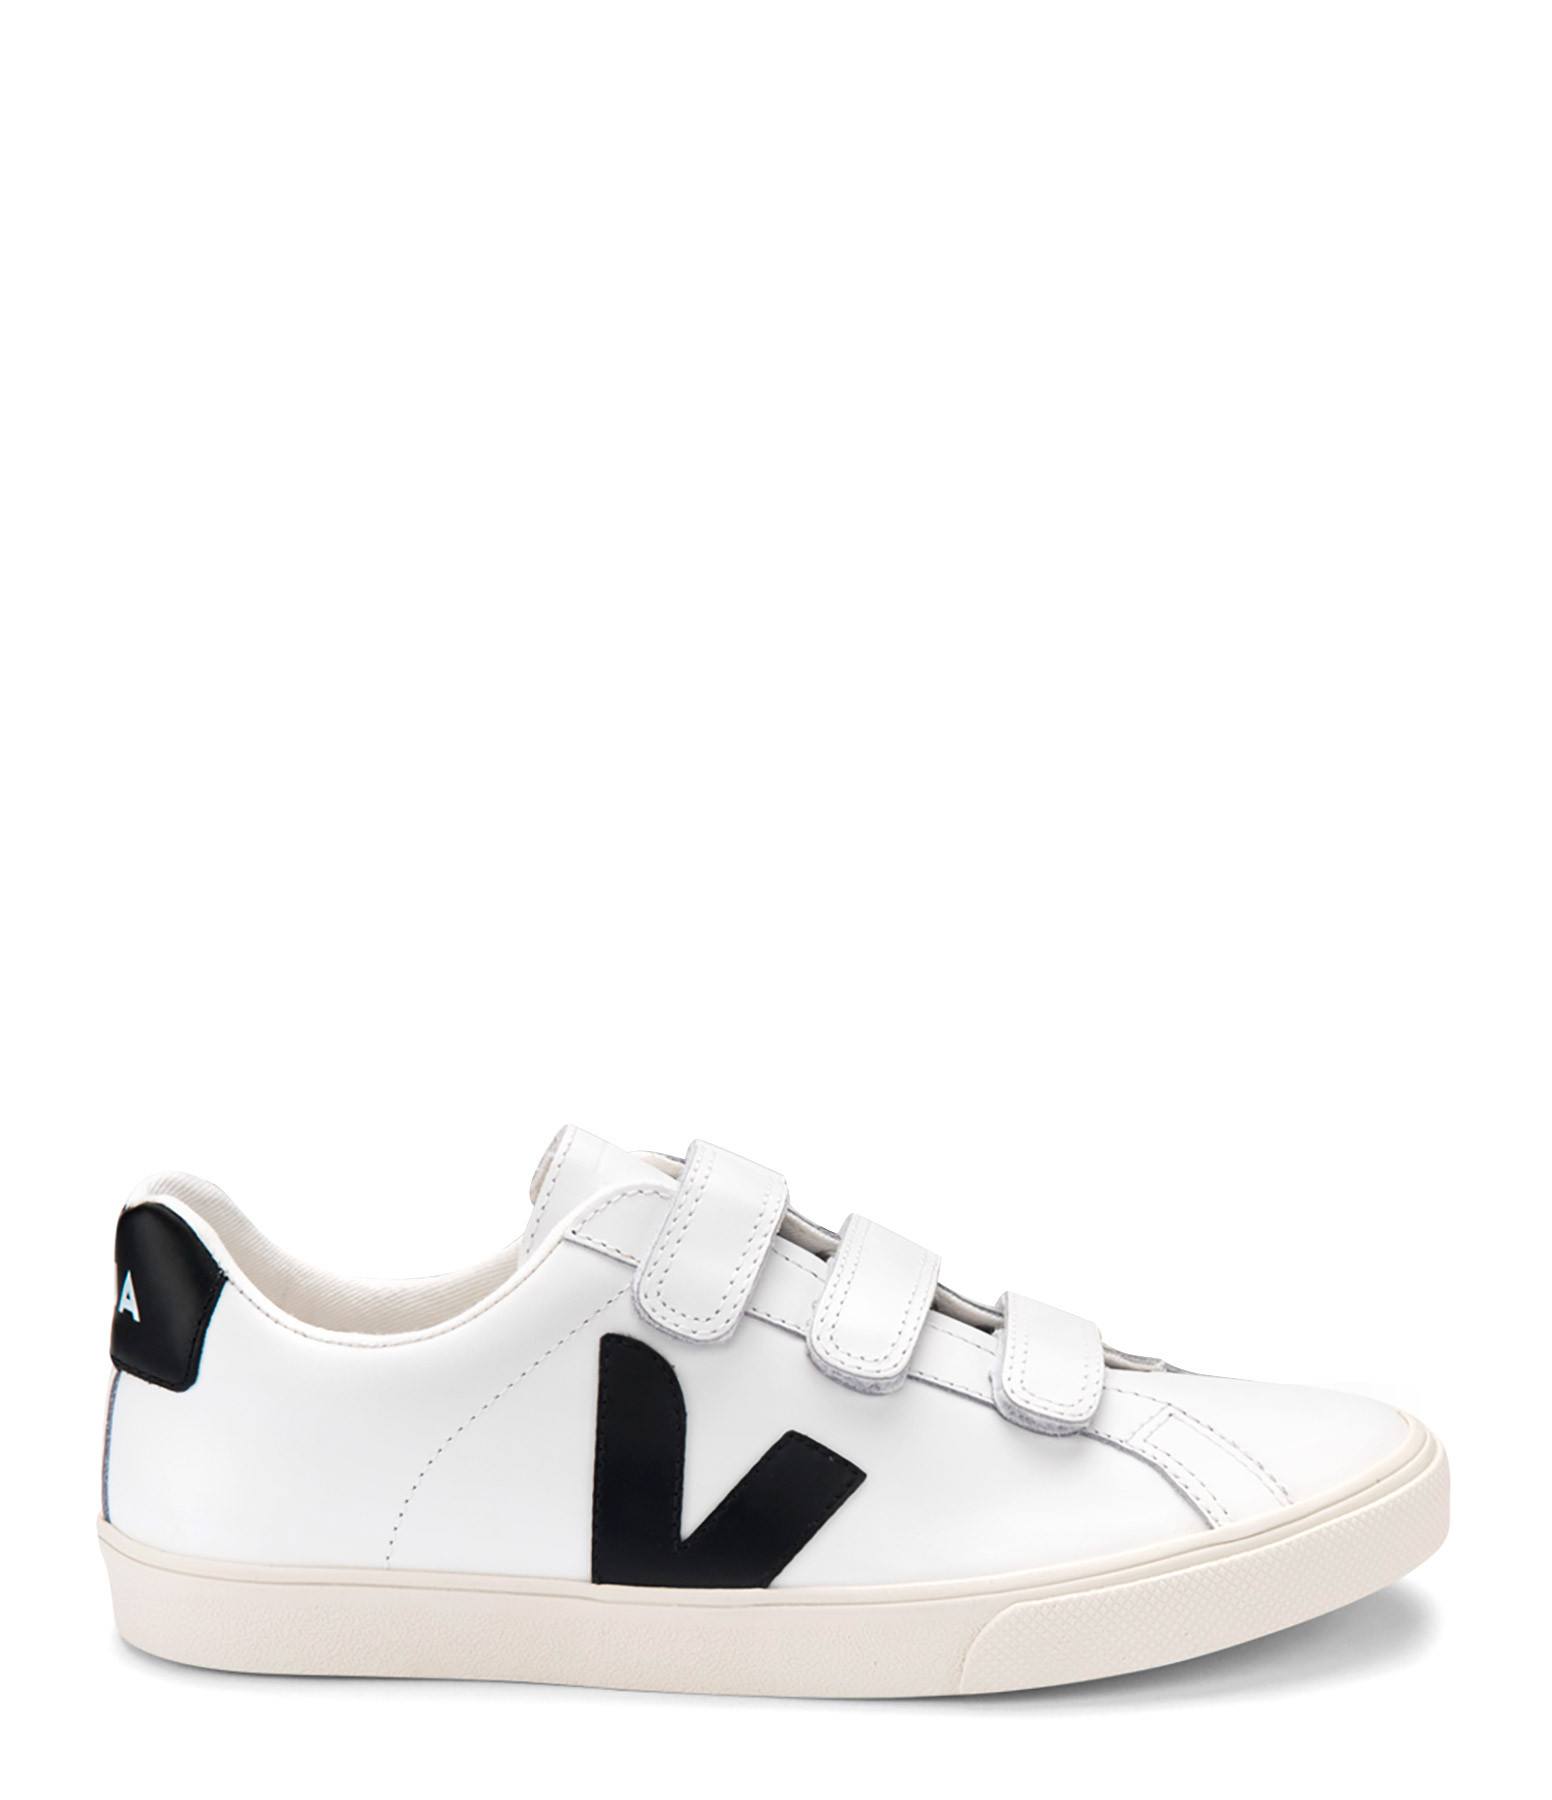 VEJA - Baskets 3-Lock Logo Cuir Extra White Noir